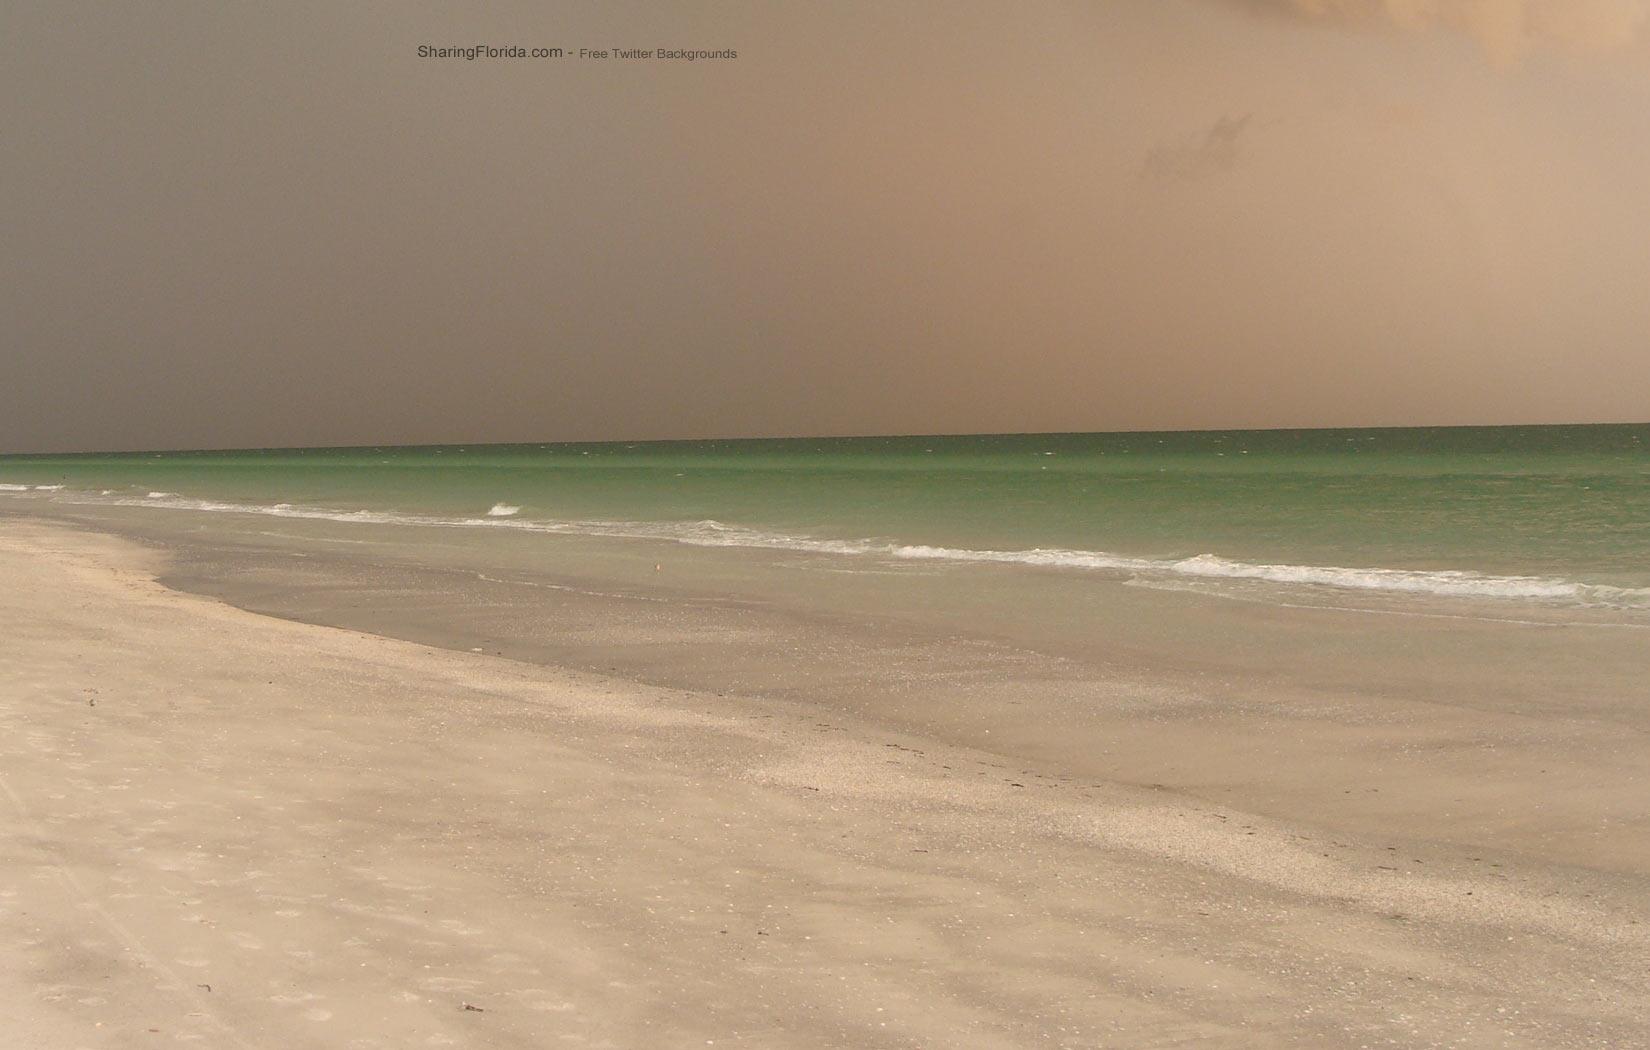 Beach Wallpaper Here Sharingflorida Com Gulf Coast Backgrounds